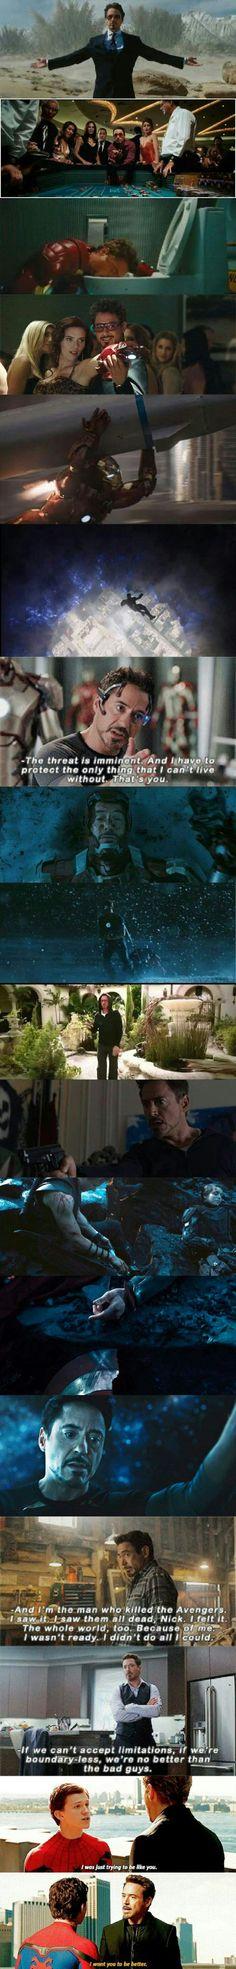 Tony Stark's character development - 9GAG